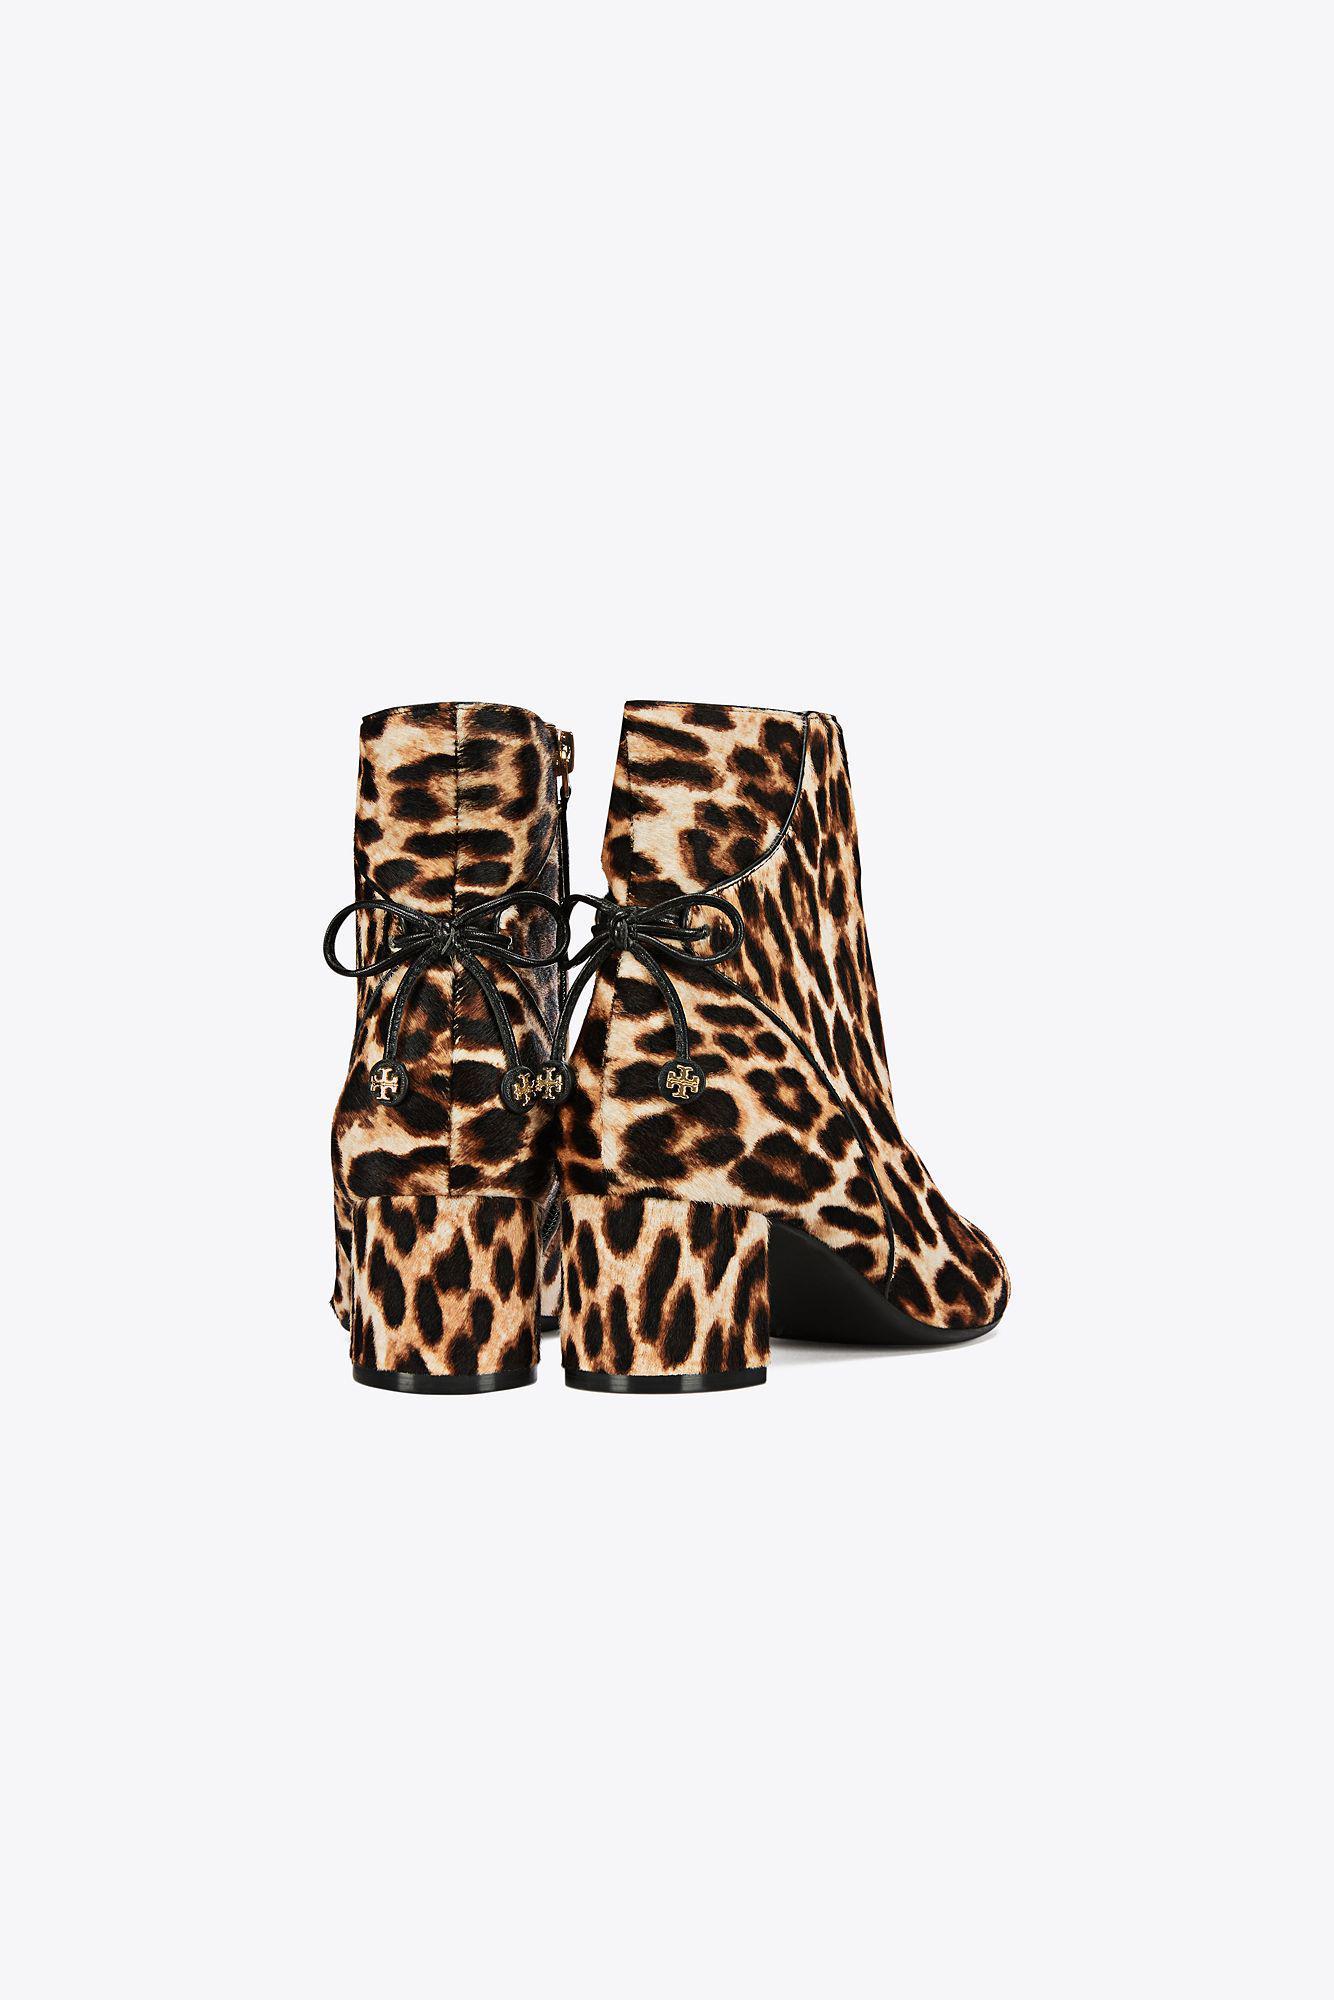 0701941cdba6 Tory Burch Woman Bow-detailed Leopard-print Calf Hair Ankle Boots ...